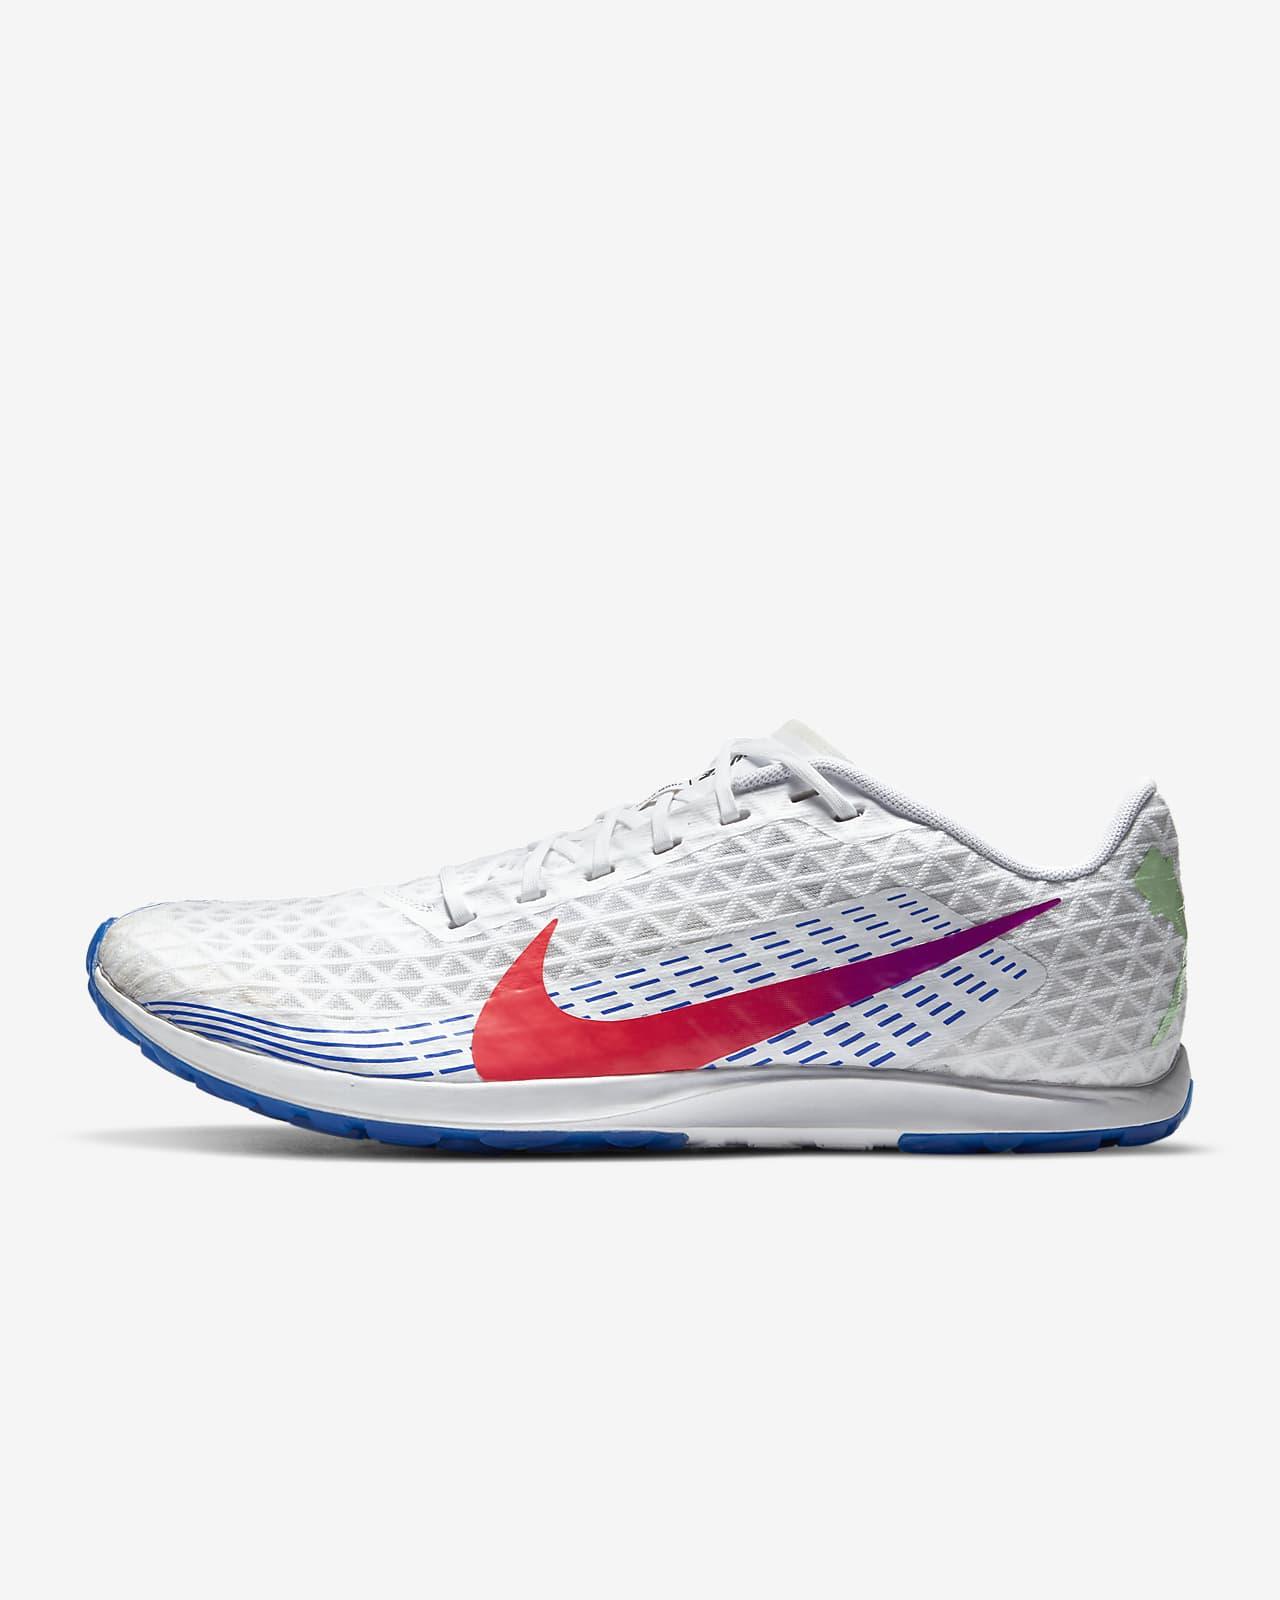 Nike Zoom Rival XC (2019) Unisex-Sprintschuh